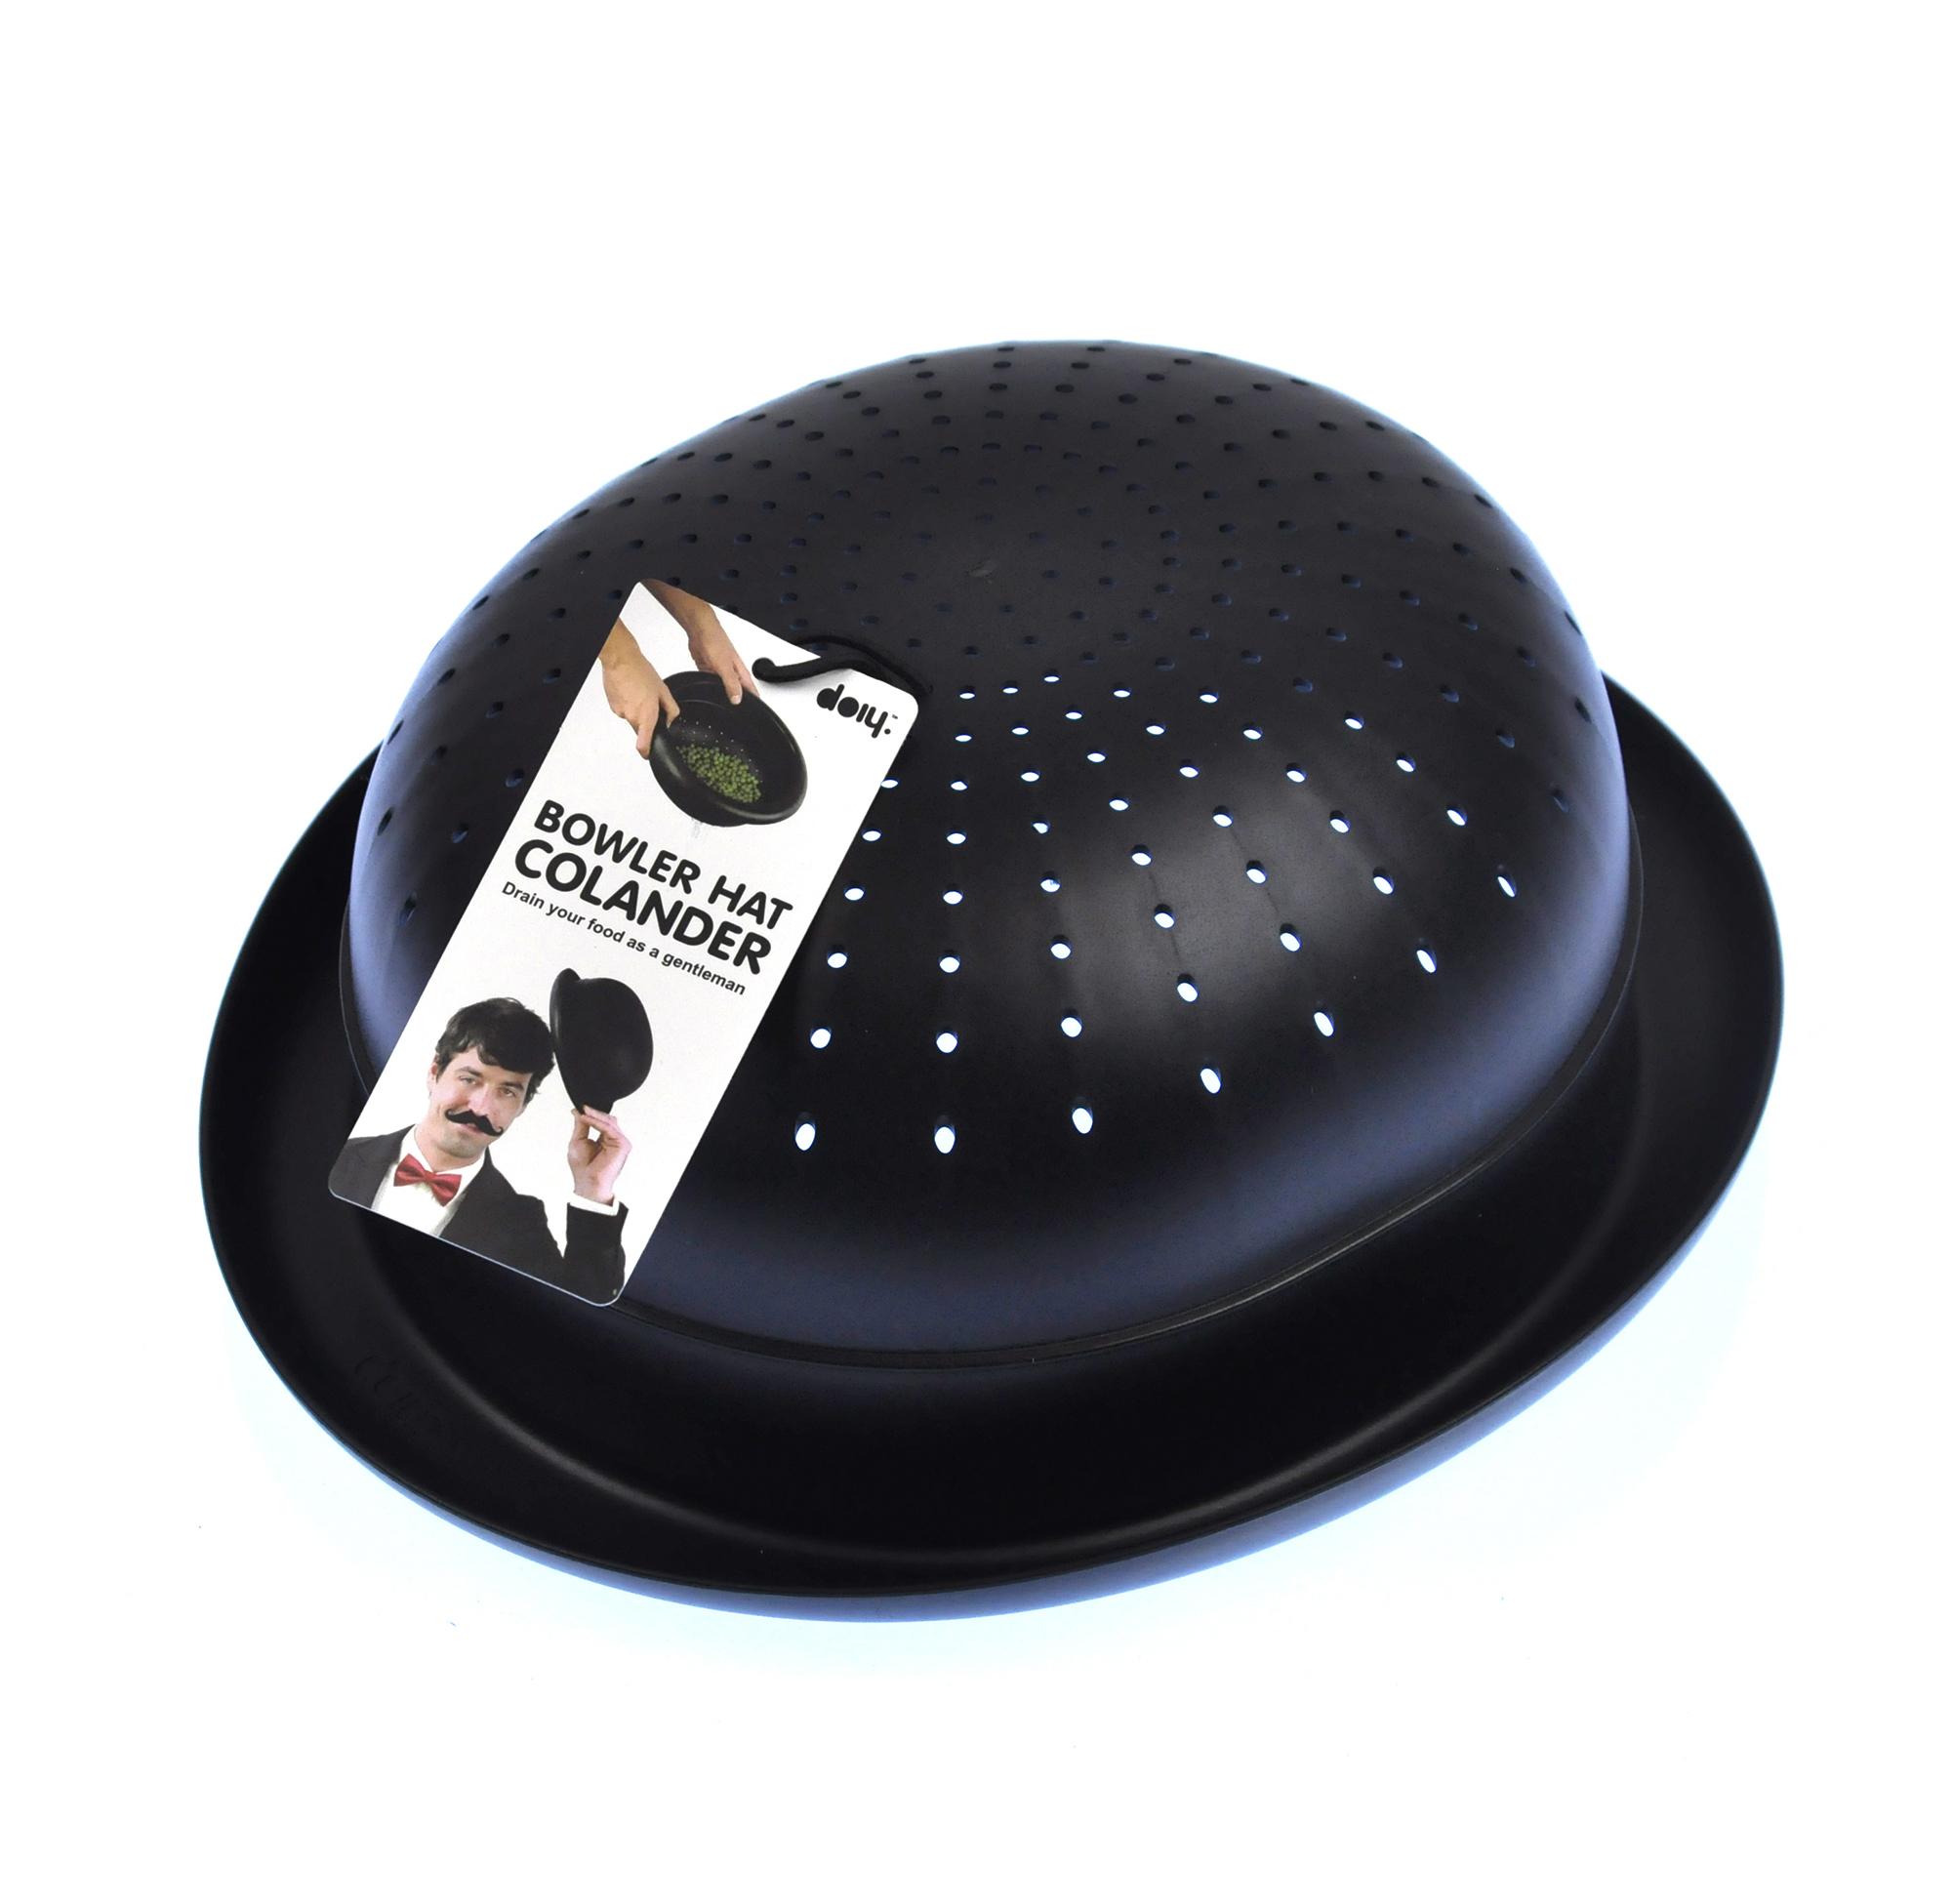 edf11b95bd7cc Bowler Hat Colander Thumbnail 1 ...